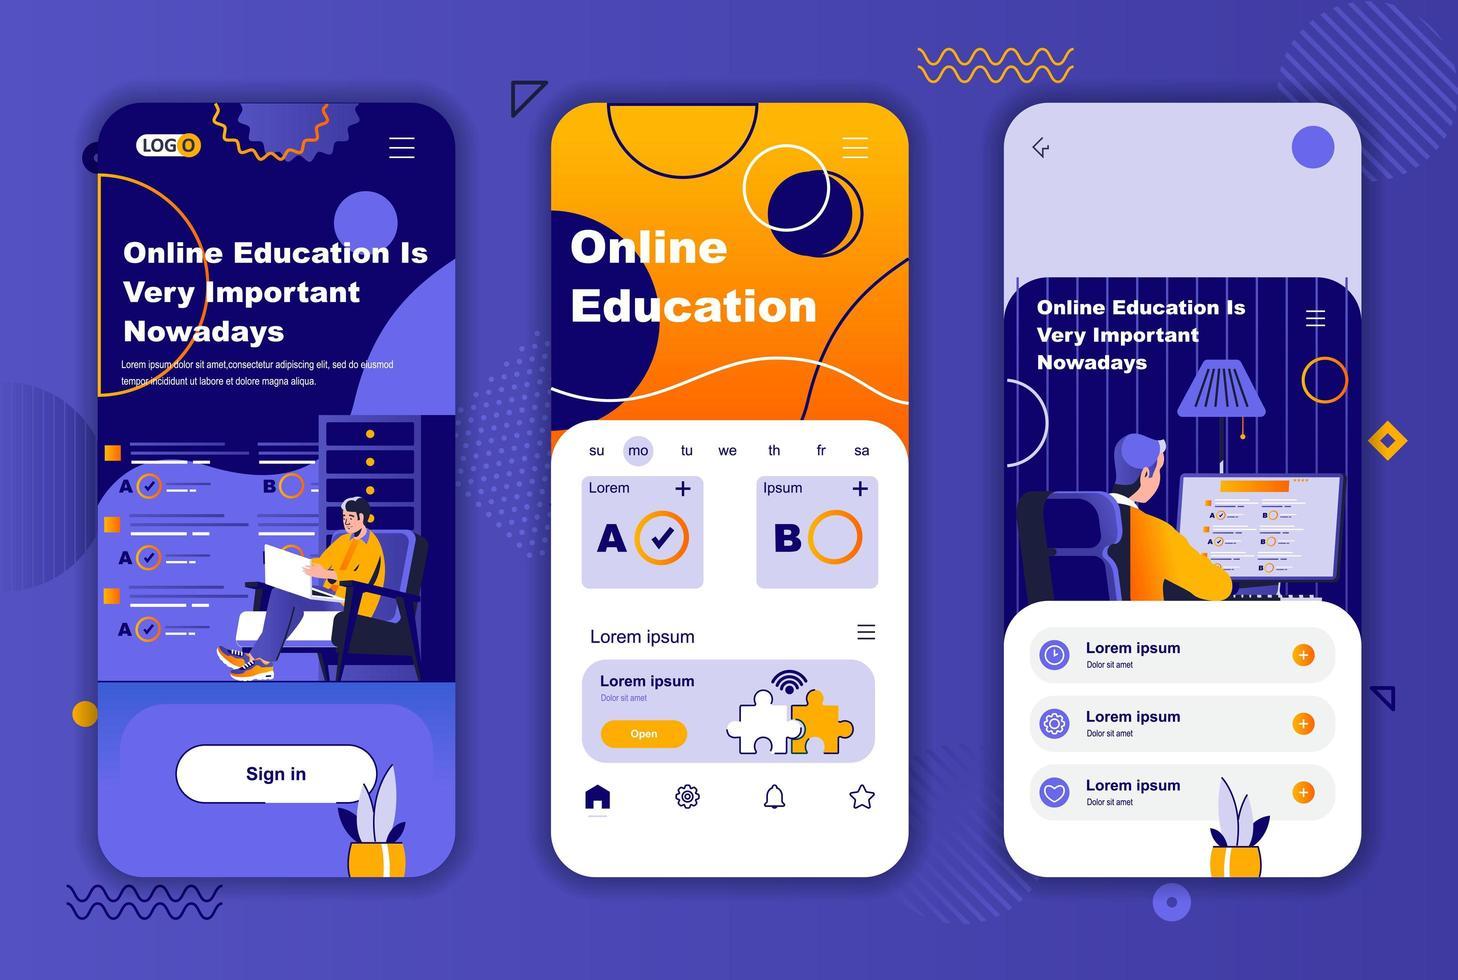 Online education unique design for social networks stories. vector